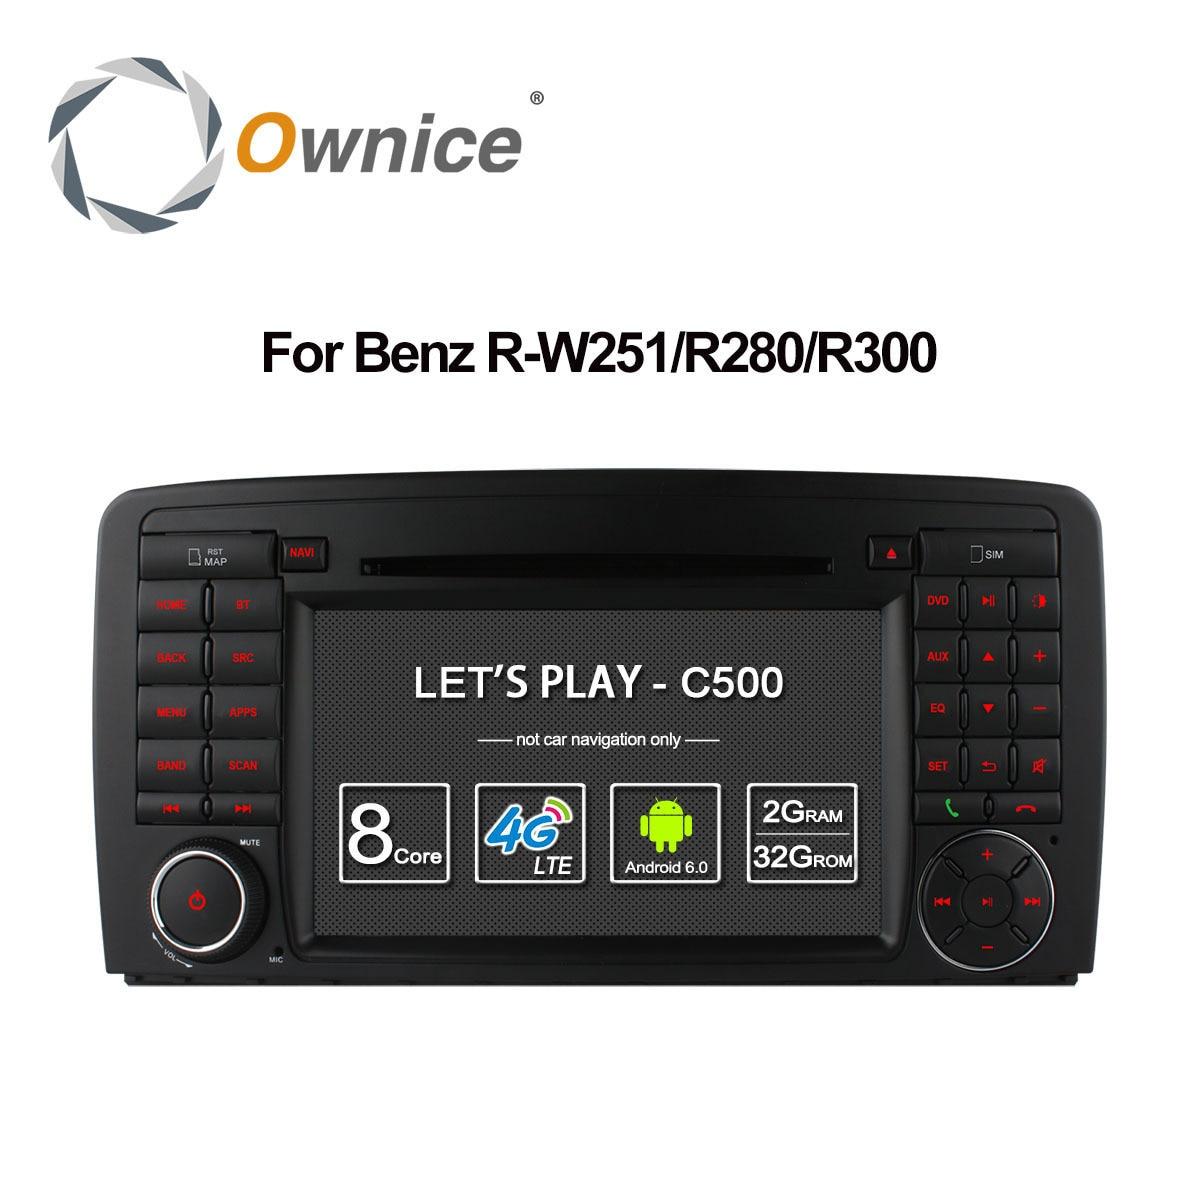 Ownice 4G SIM LTE 8 Core Android 6.0 Car DVD Player for Mercedes R Class W251 R280 R300 R320 R350 R500 with Radio GPS 32G ROM ownice c500 4g sim lte octa 8 core android 6 0 for kia ceed 2013 2015 car dvd player gps navi radio wifi 4g bt 2gb ram 32g rom